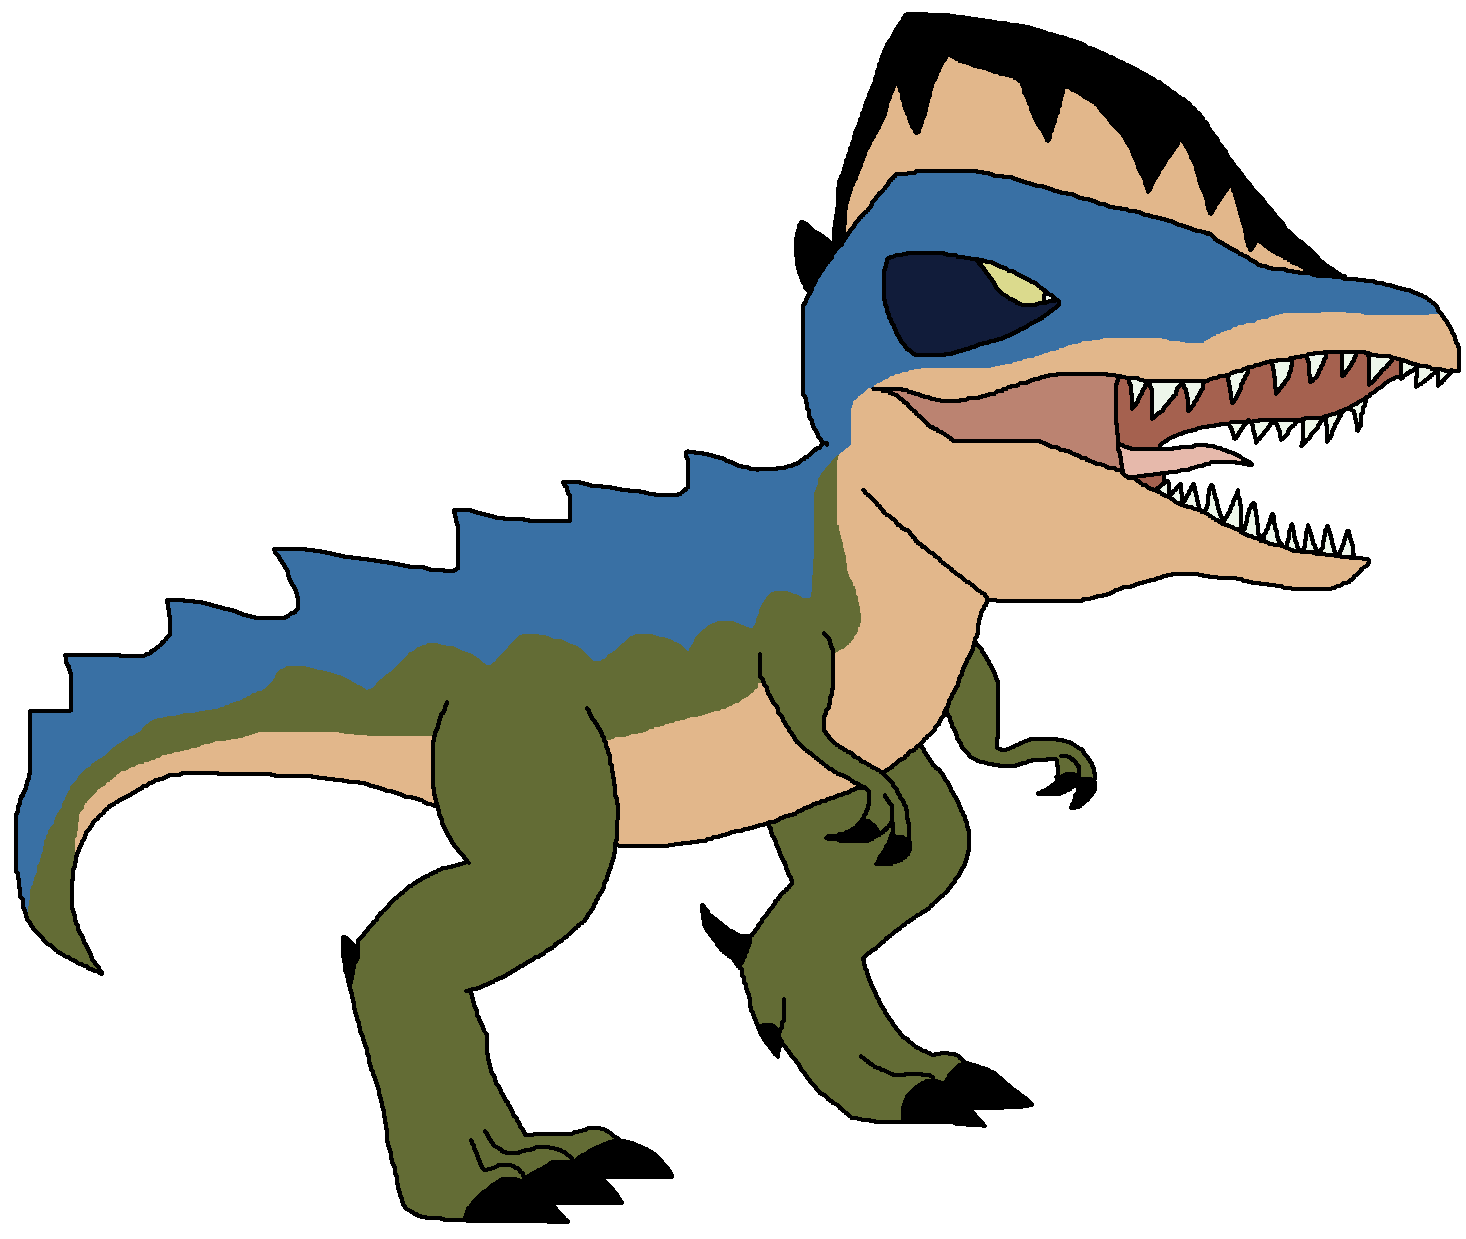 Image alangasaurus png pedia. Crocodile clipart dinosaur